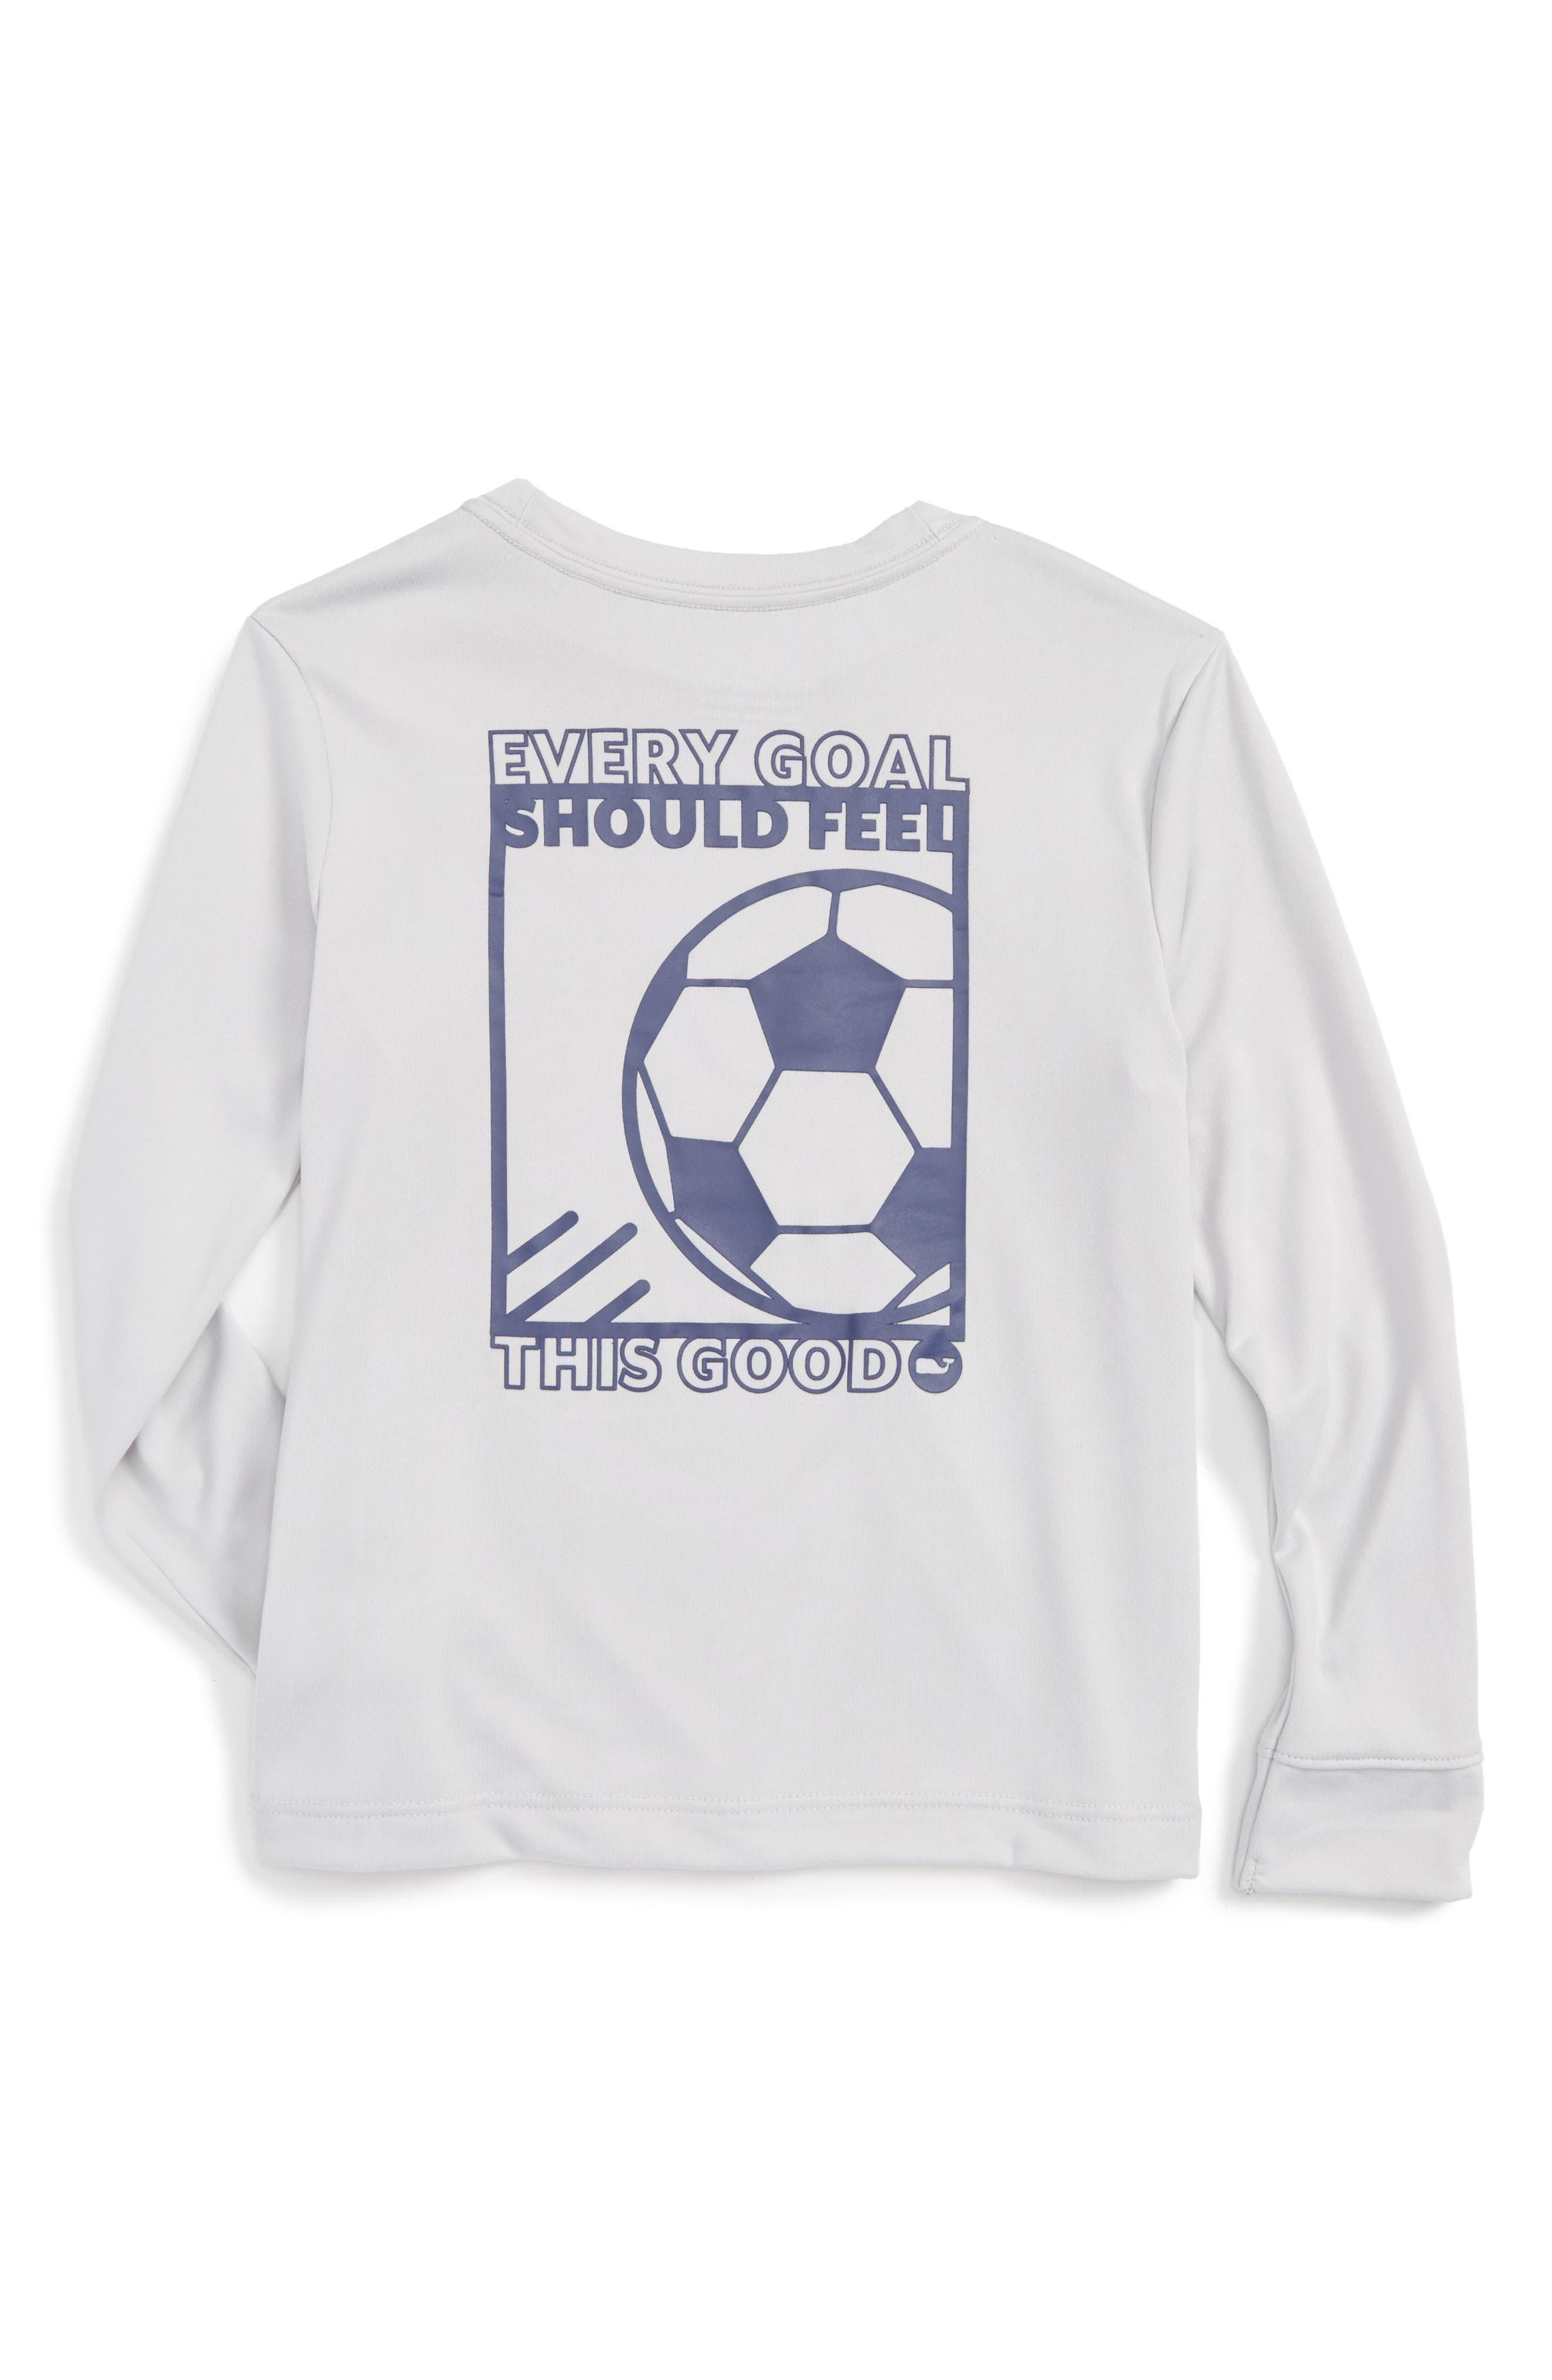 VINEYARD VINES,                             Soccer Box Performance T-Shirt,                             Main thumbnail 1, color,                             062